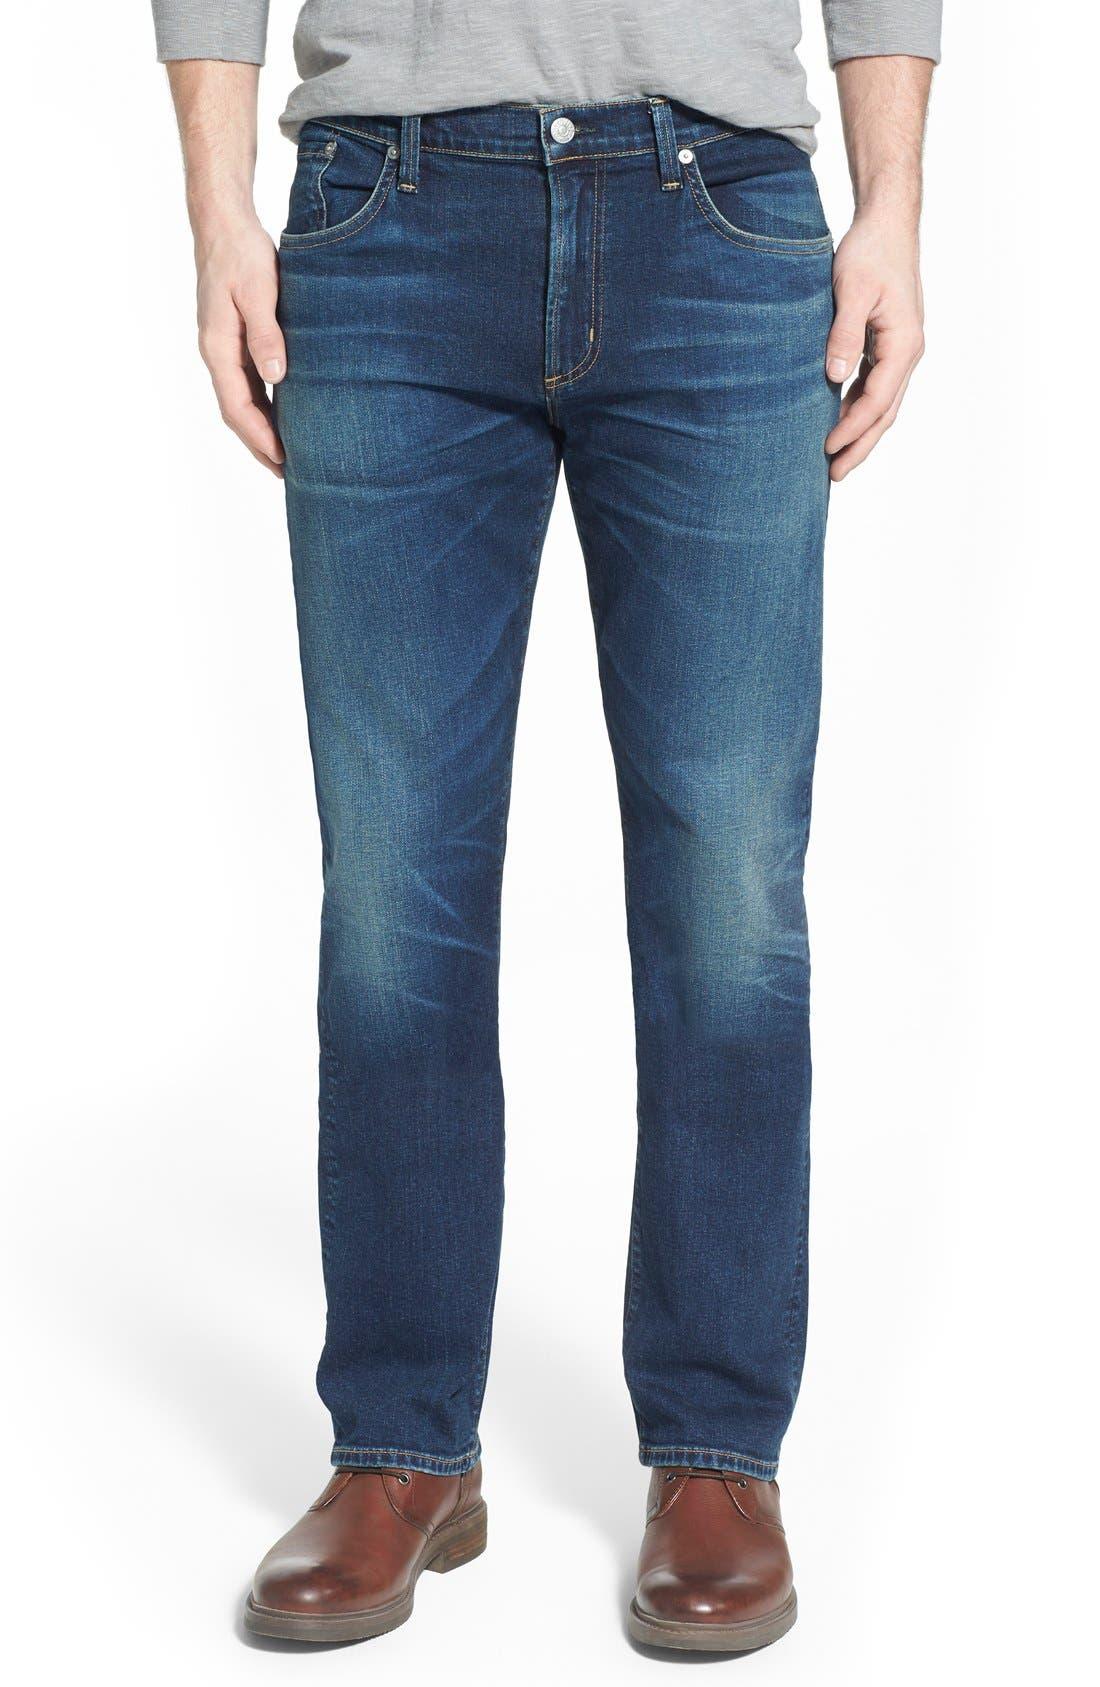 Main Image - Citizens of Humanity 'Core' Slim Straight Leg Jeans (Brigade)